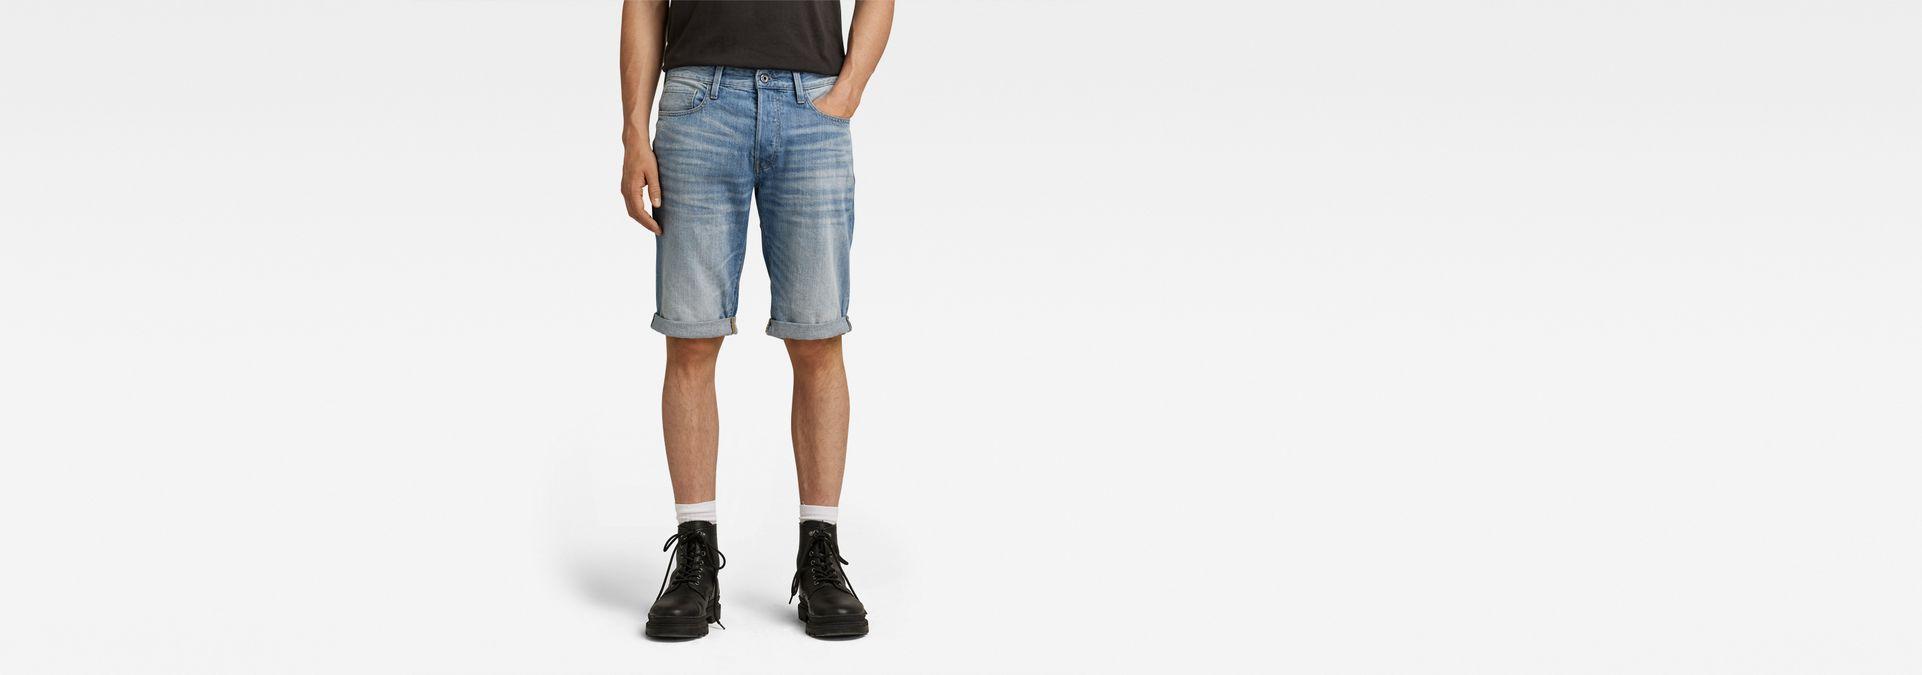 Aged Men Length Star 12 G 3301 Lt Raw® Sale Shorts FawIcqZ